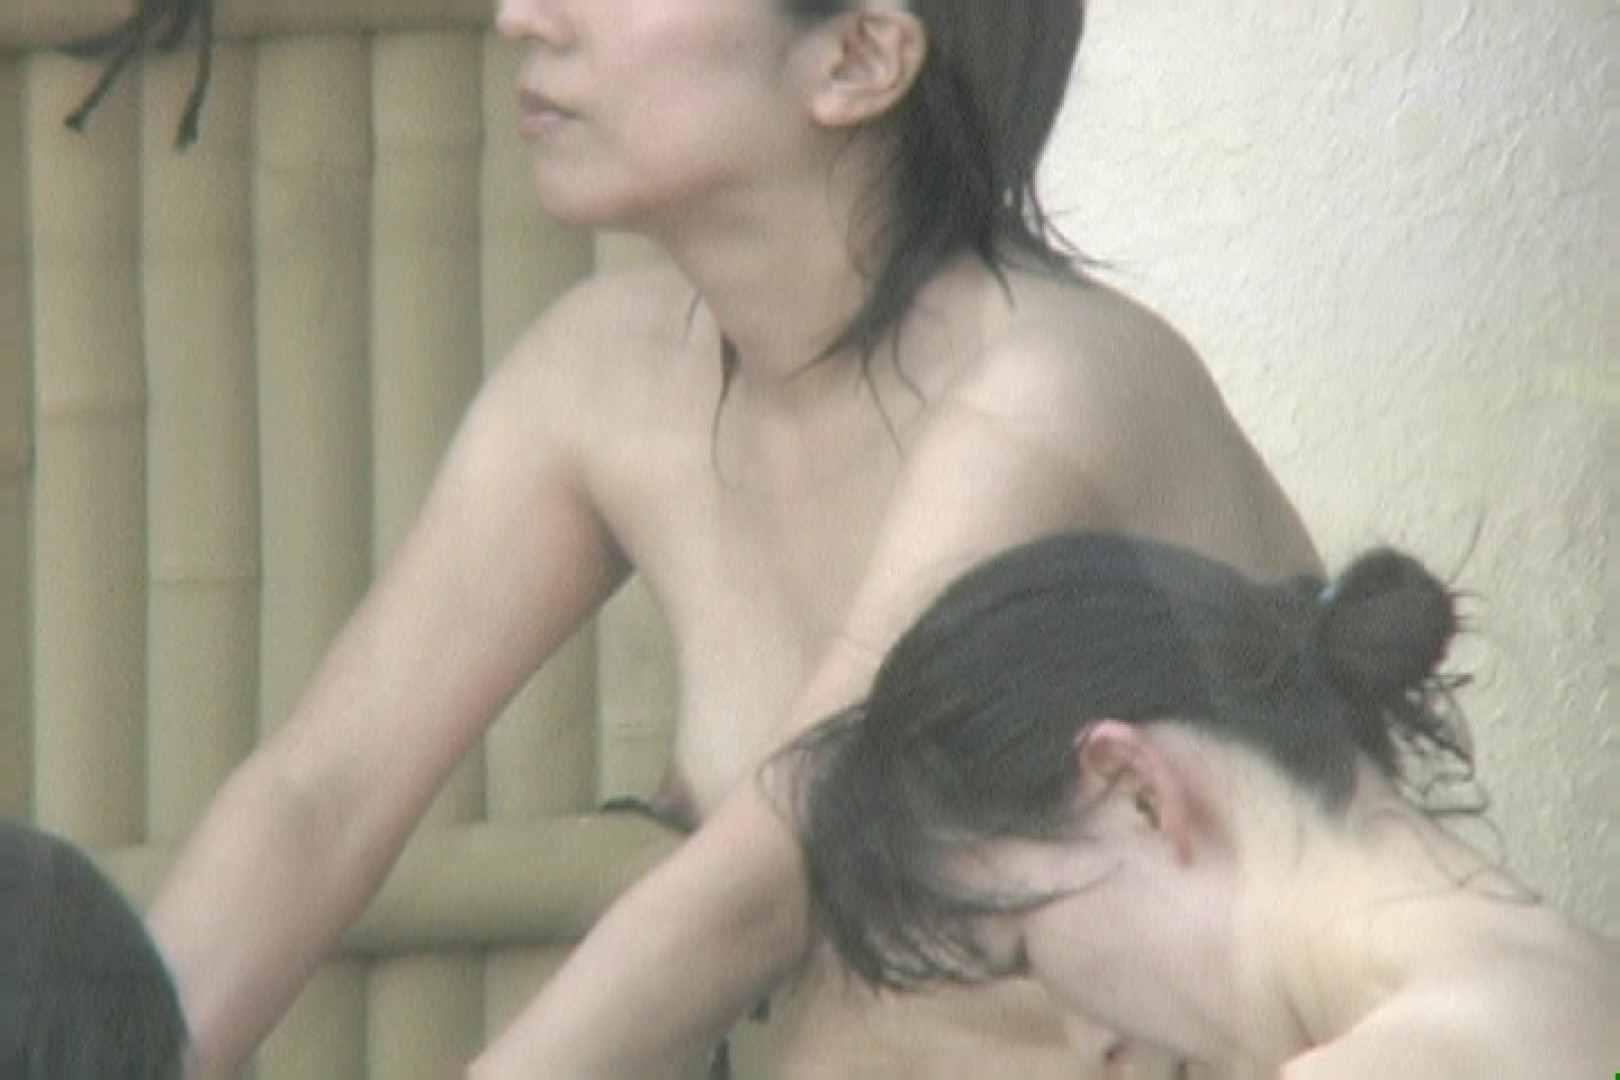 Aquaな露天風呂Vol.694 露天 オメコ無修正動画無料 110PICs 23